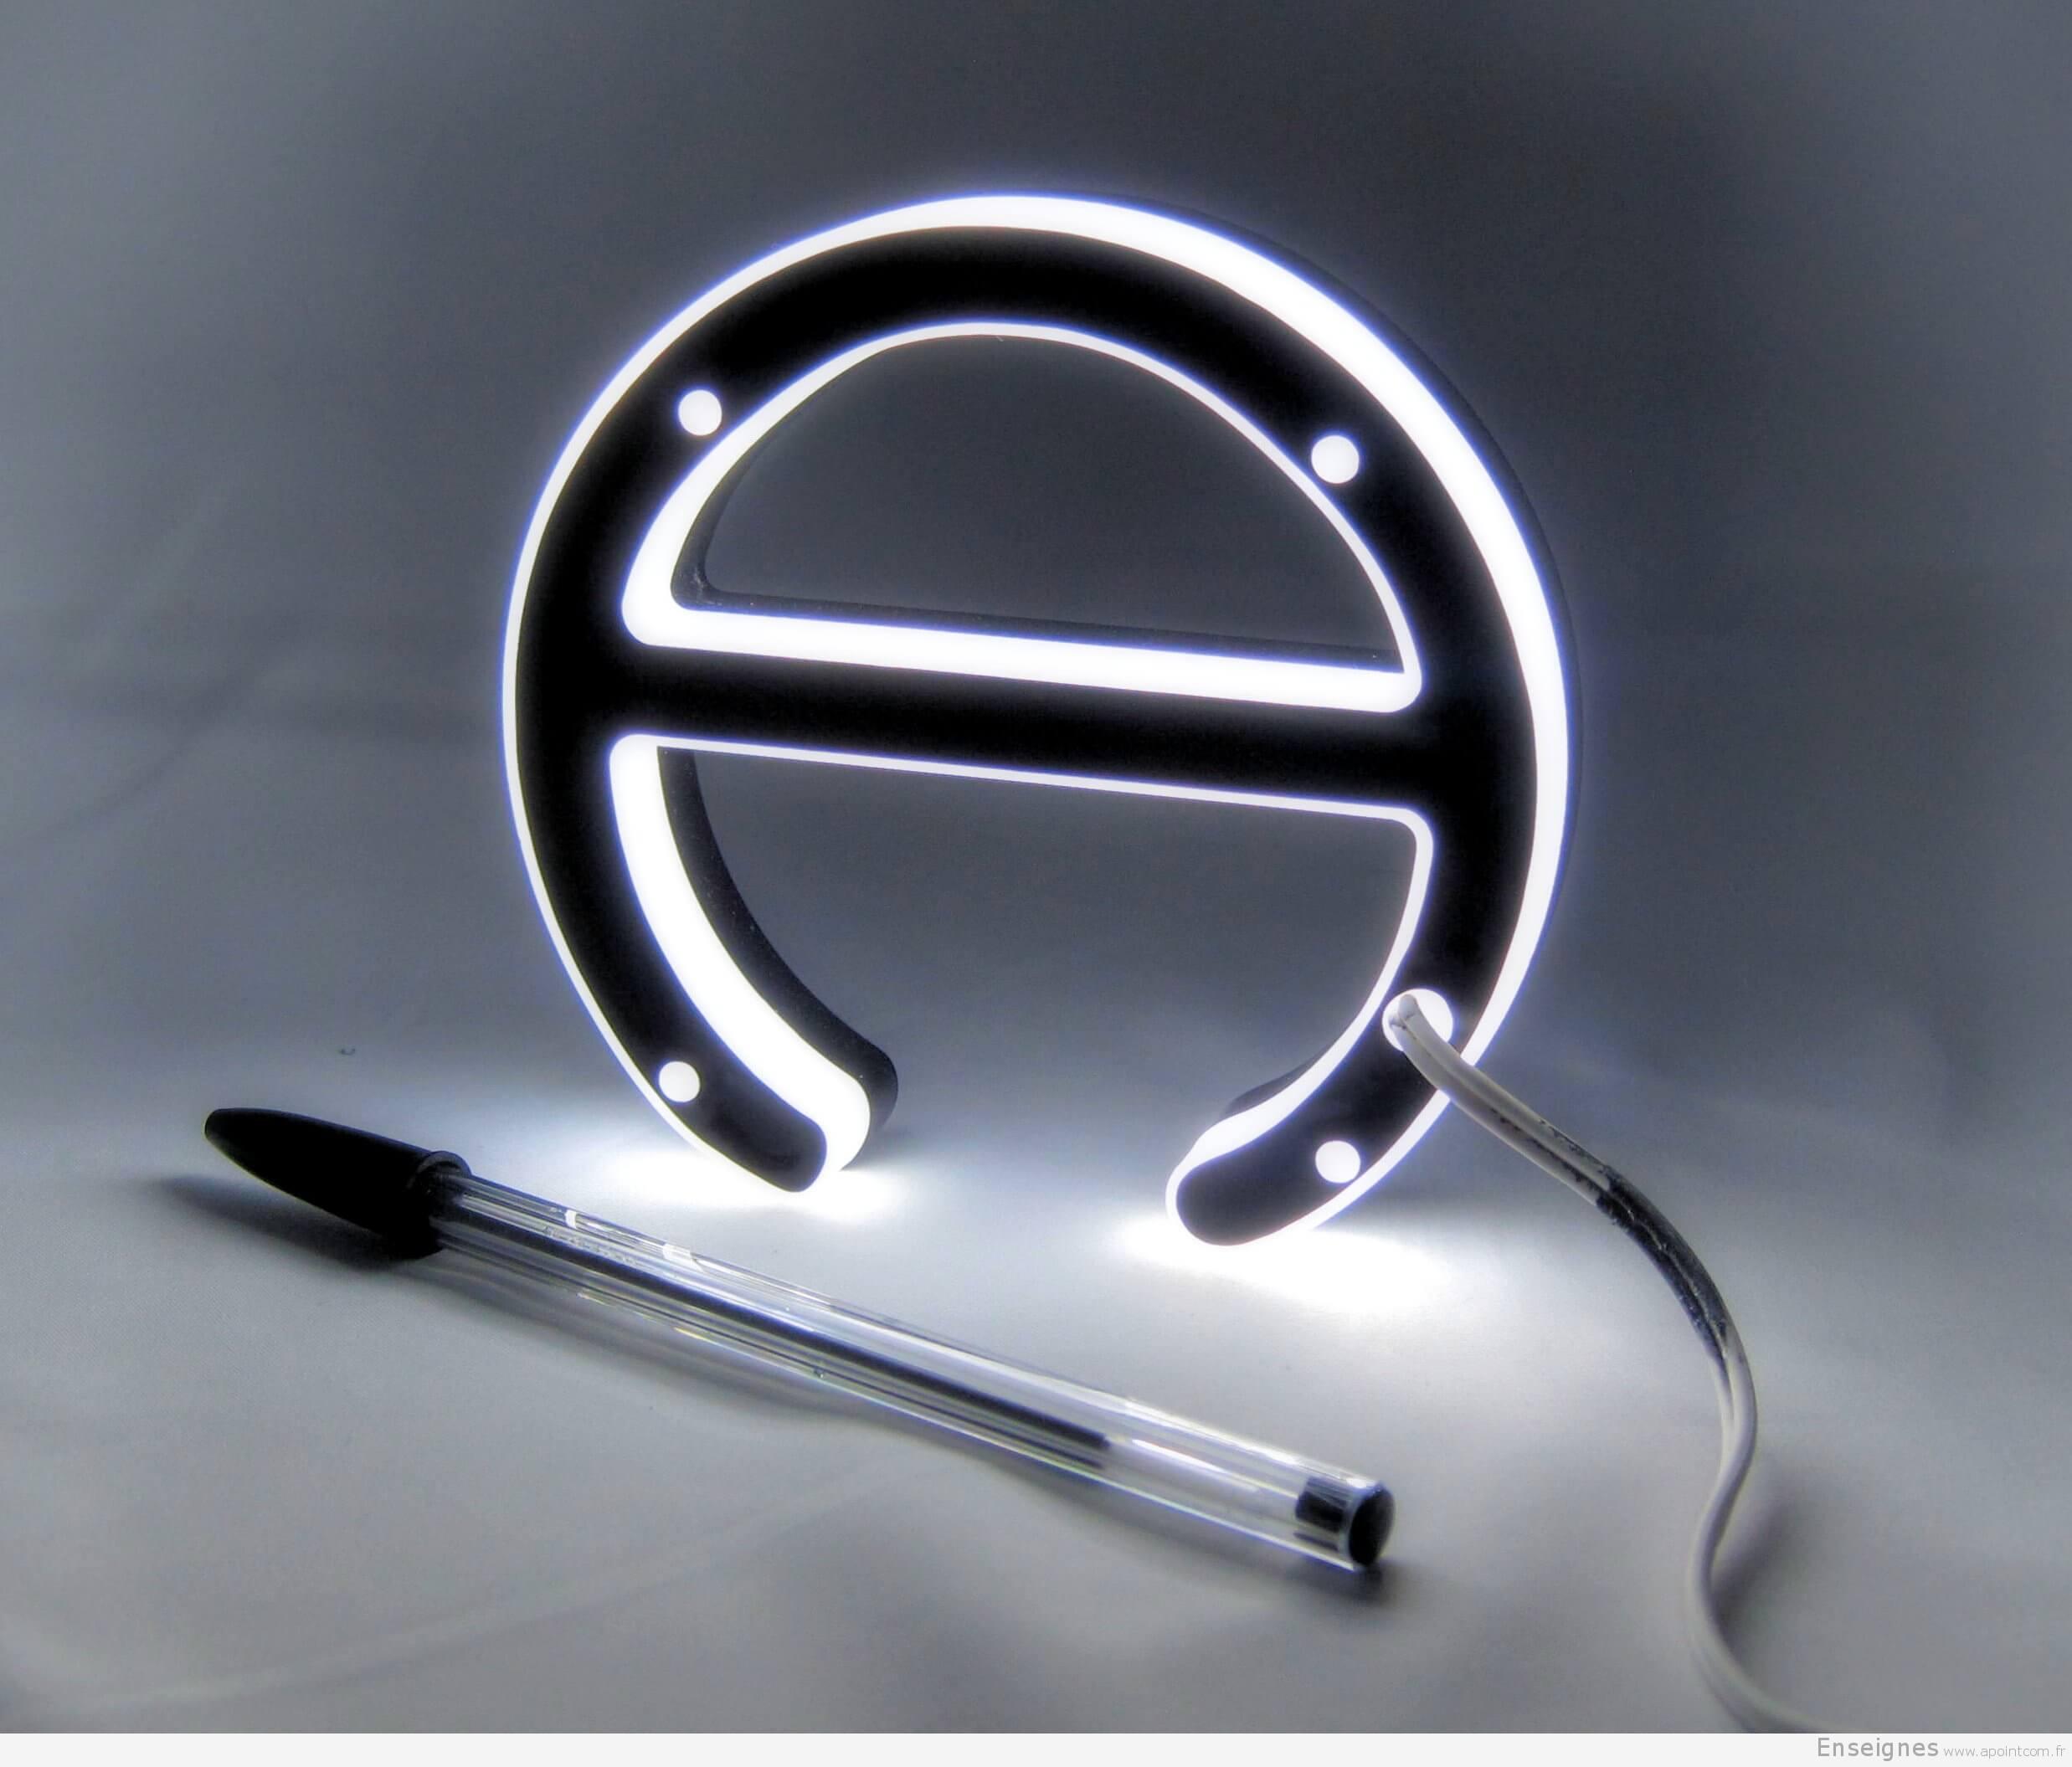 Fabuleux Fabrication lettre relief lumineuse en Plexiglas Paris YB91